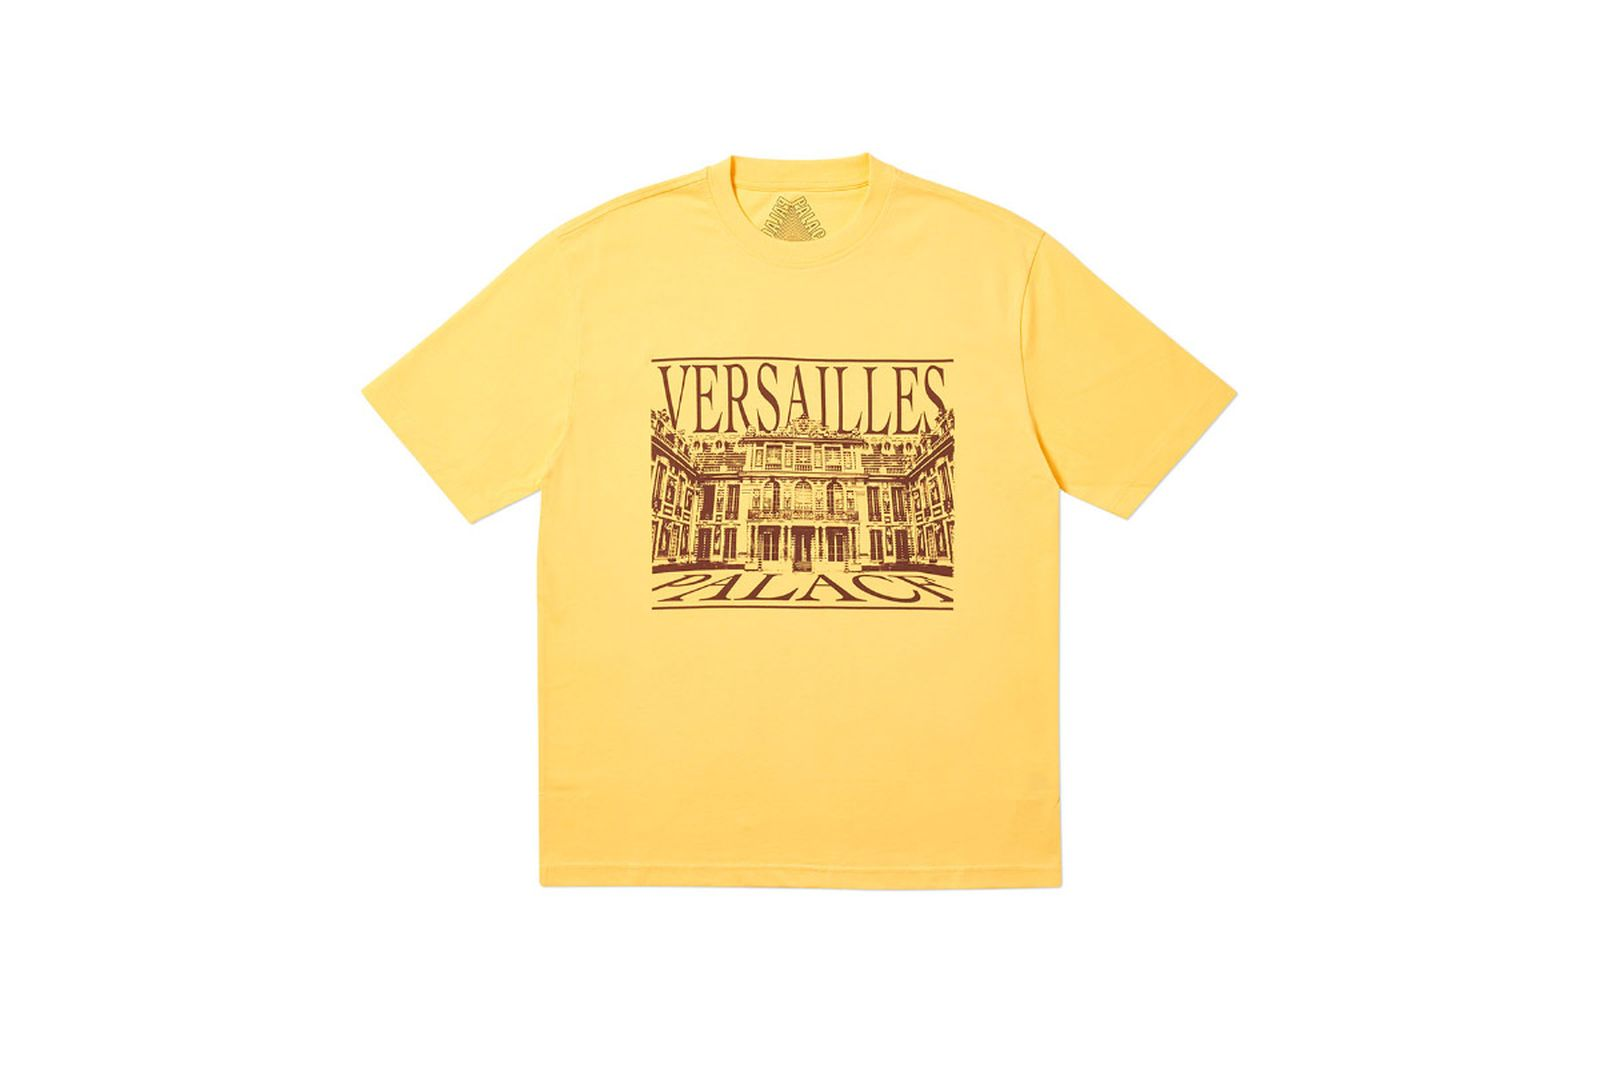 Palace 2019 Autumn T Shirt Versailles yellow 14764 straightened